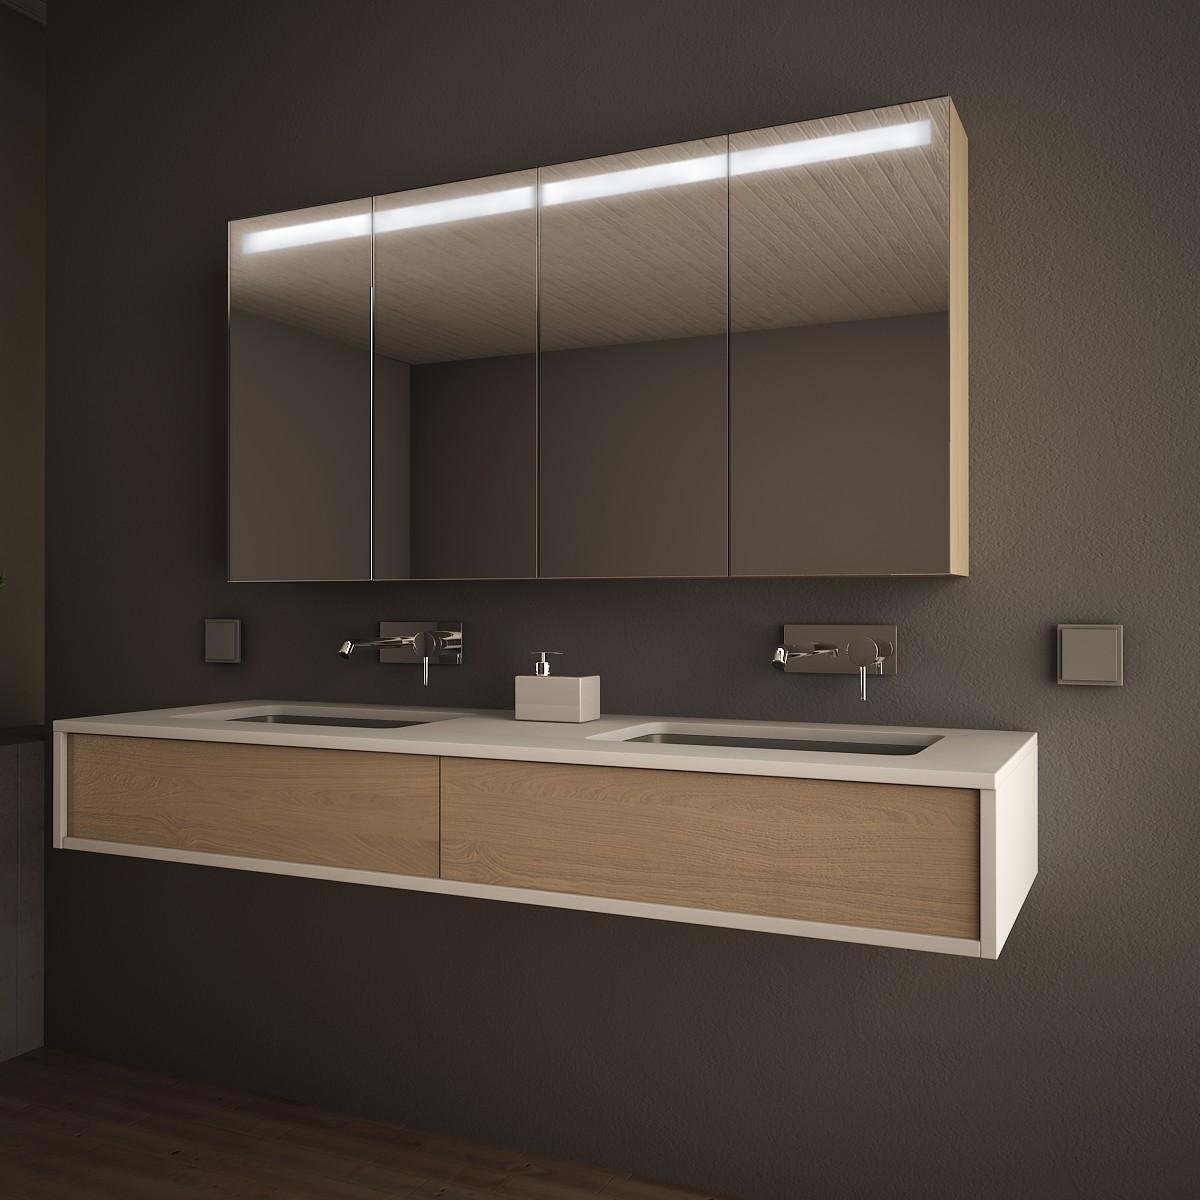 Badezimmer-Spiegelschrank Linja beleuchtet 989705277